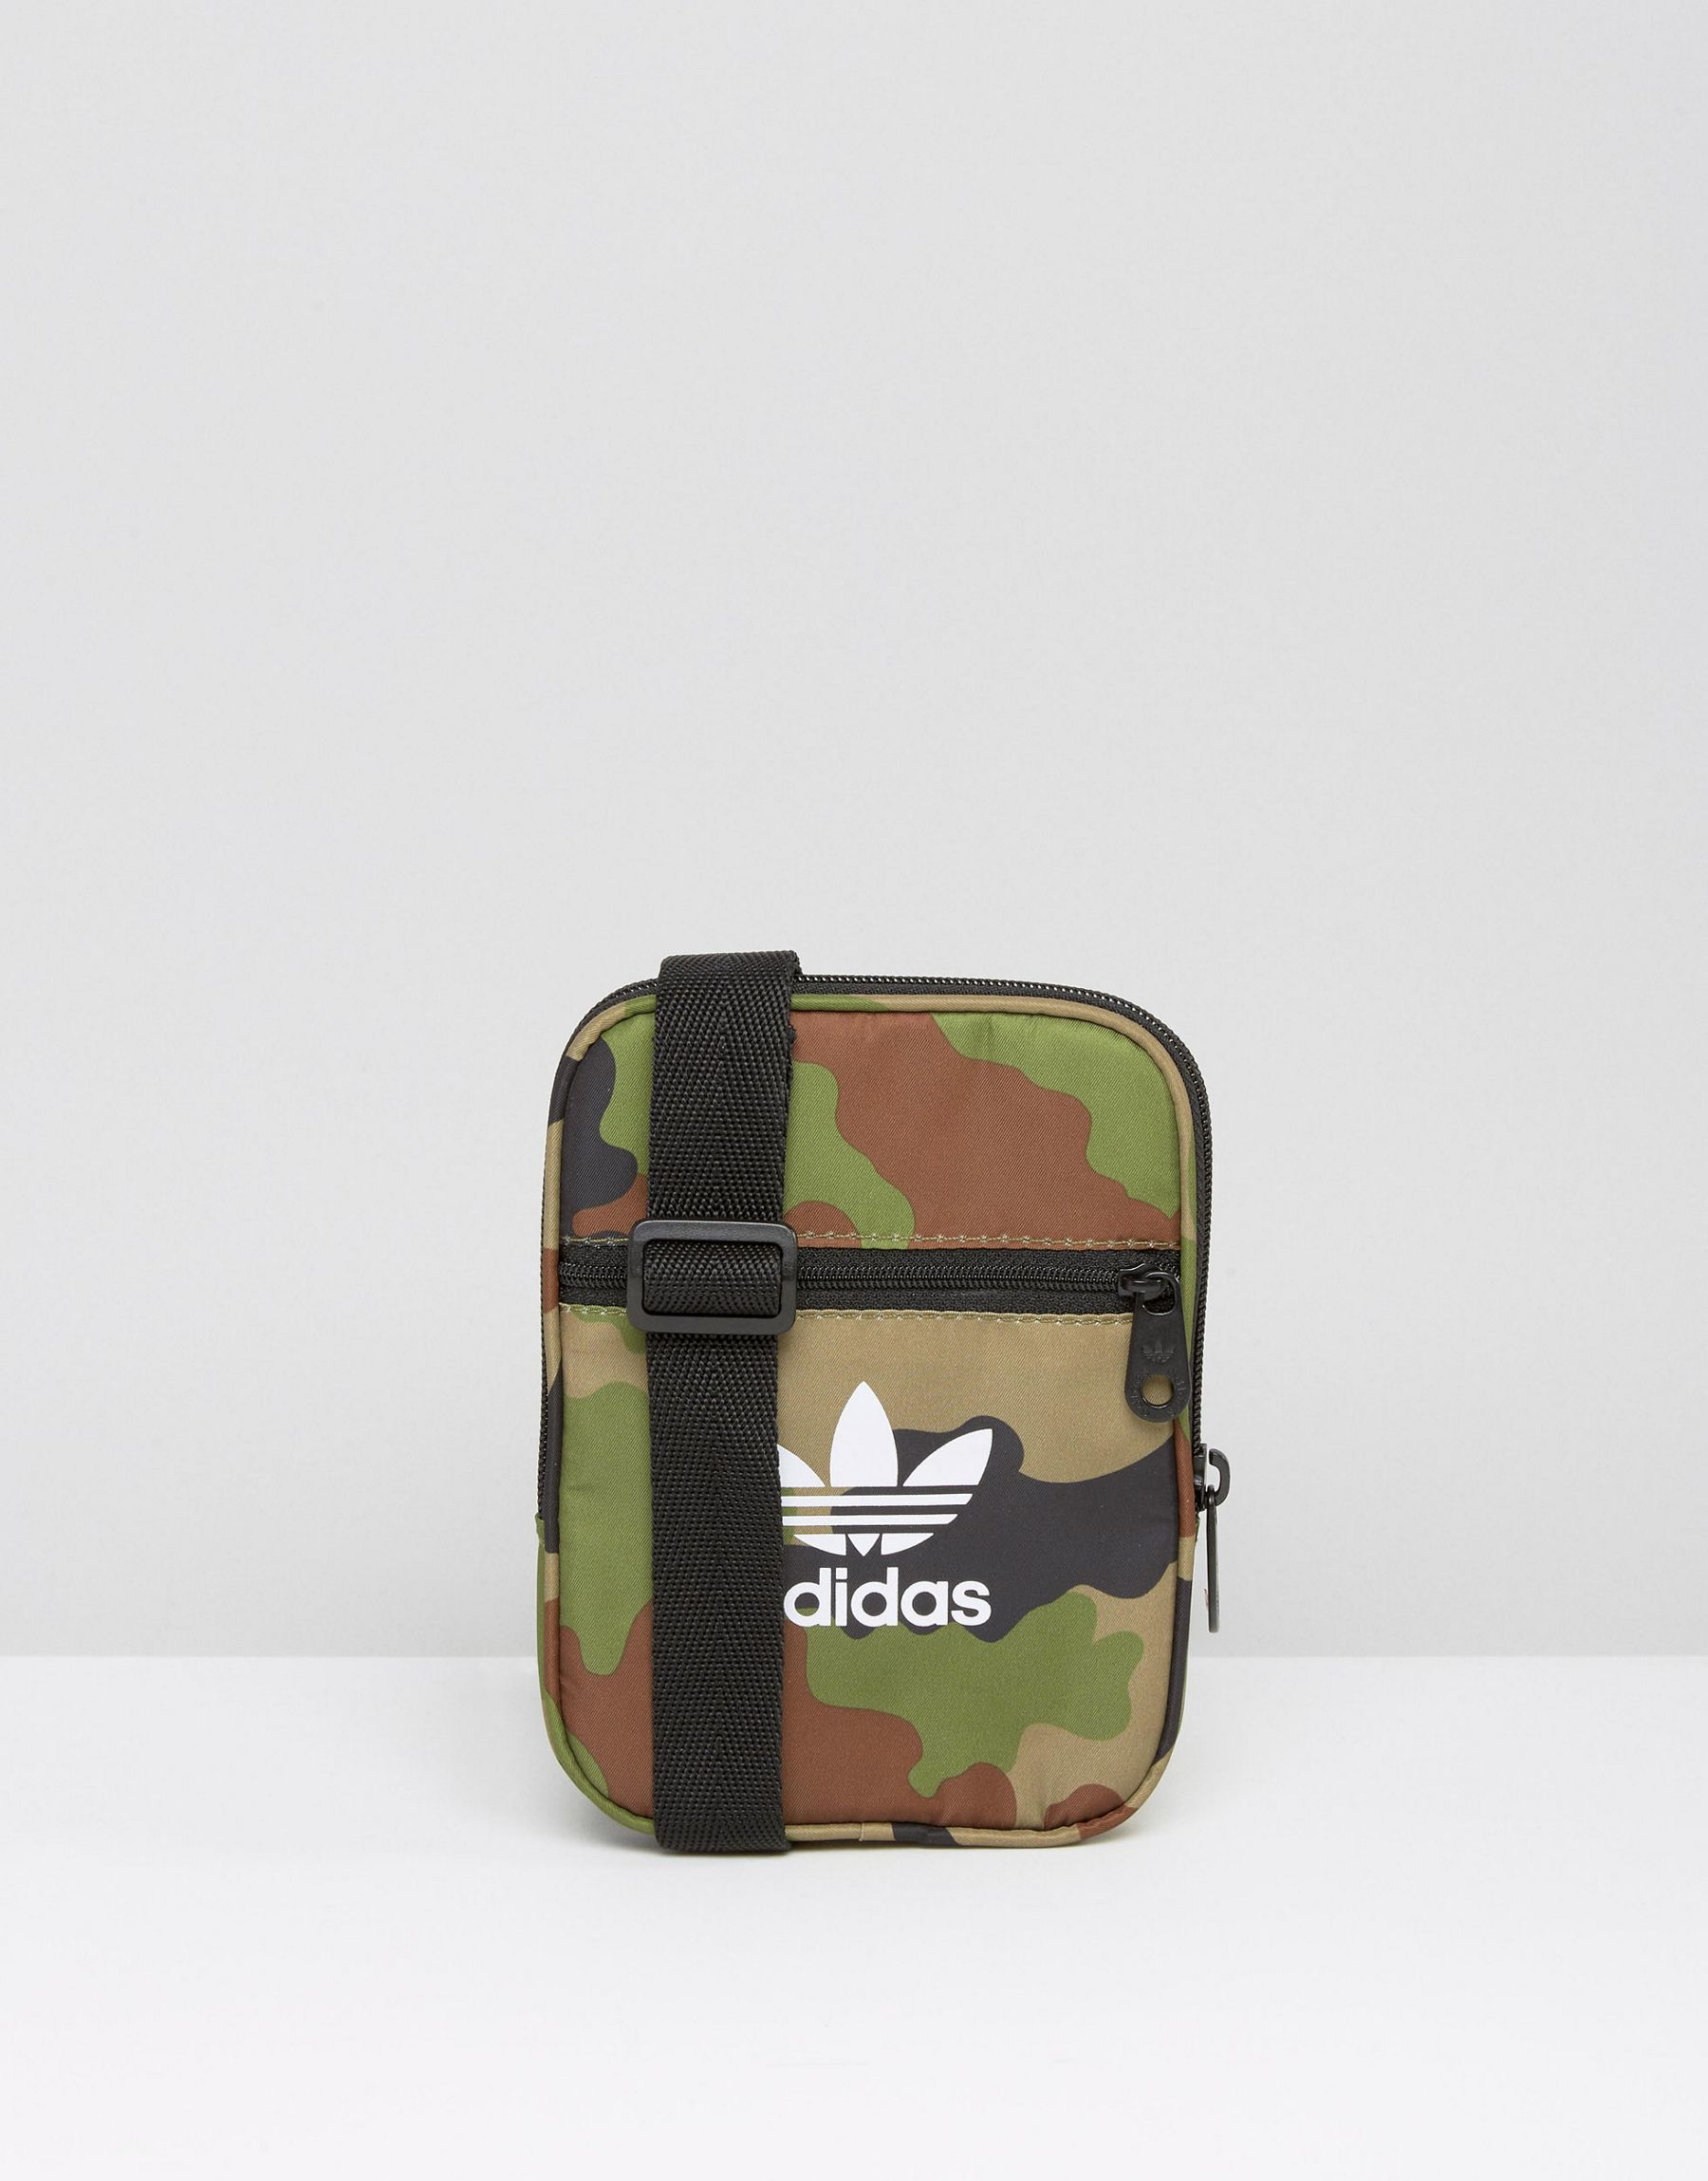 356a59162939 Lyst - adidas Originals Flight Bag In Camo Ay7765 in Green for Men